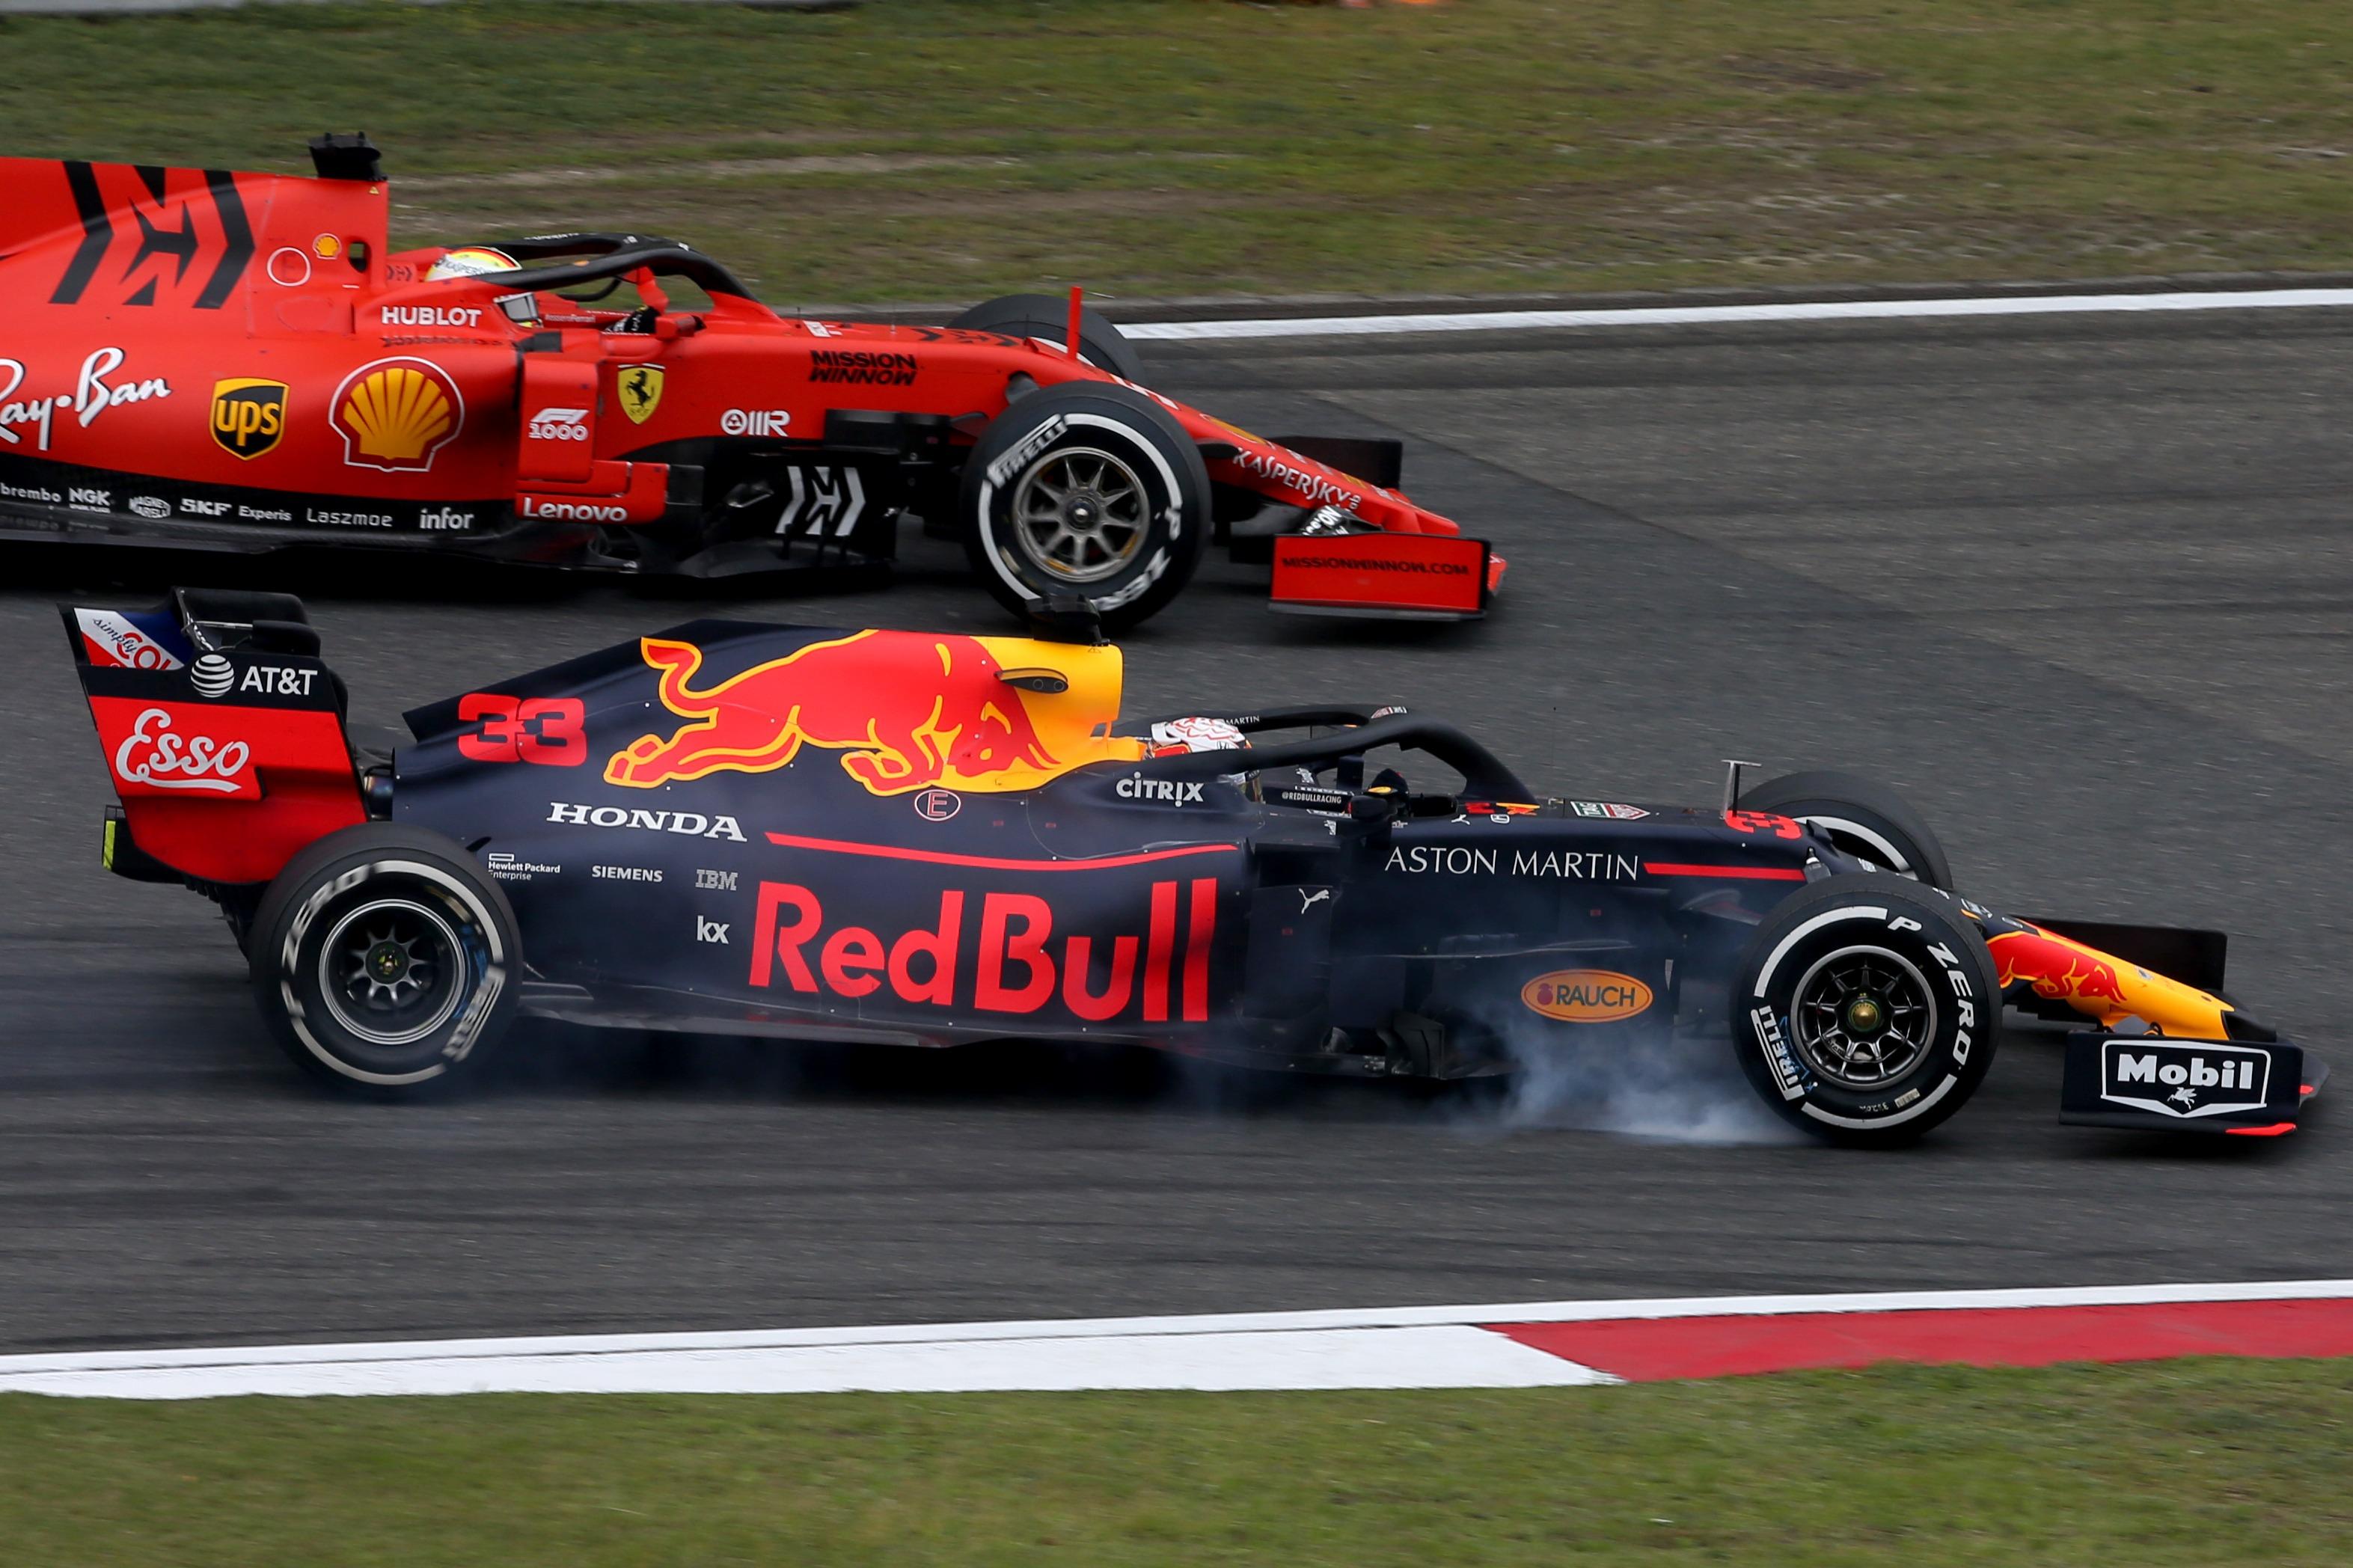 Horner does not 'suspect' Ferrari cheating | F1-Fansite com